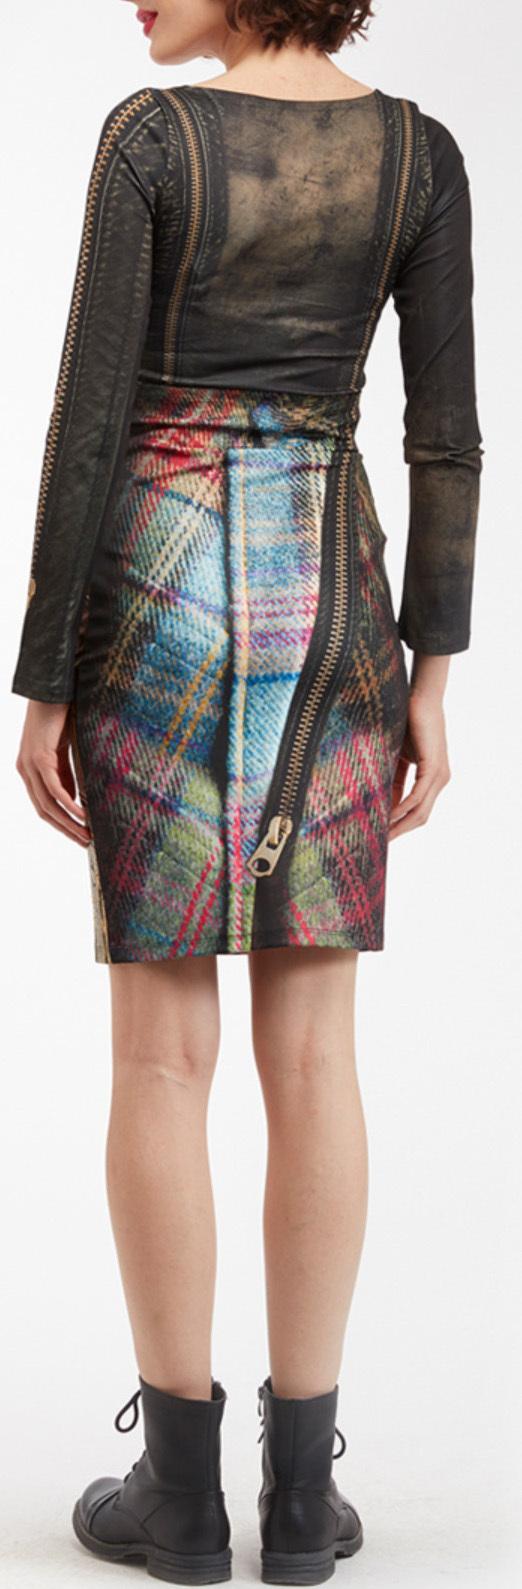 IPNG: Biker Chic Let It Snow Plaid Zip Illusion Skirt